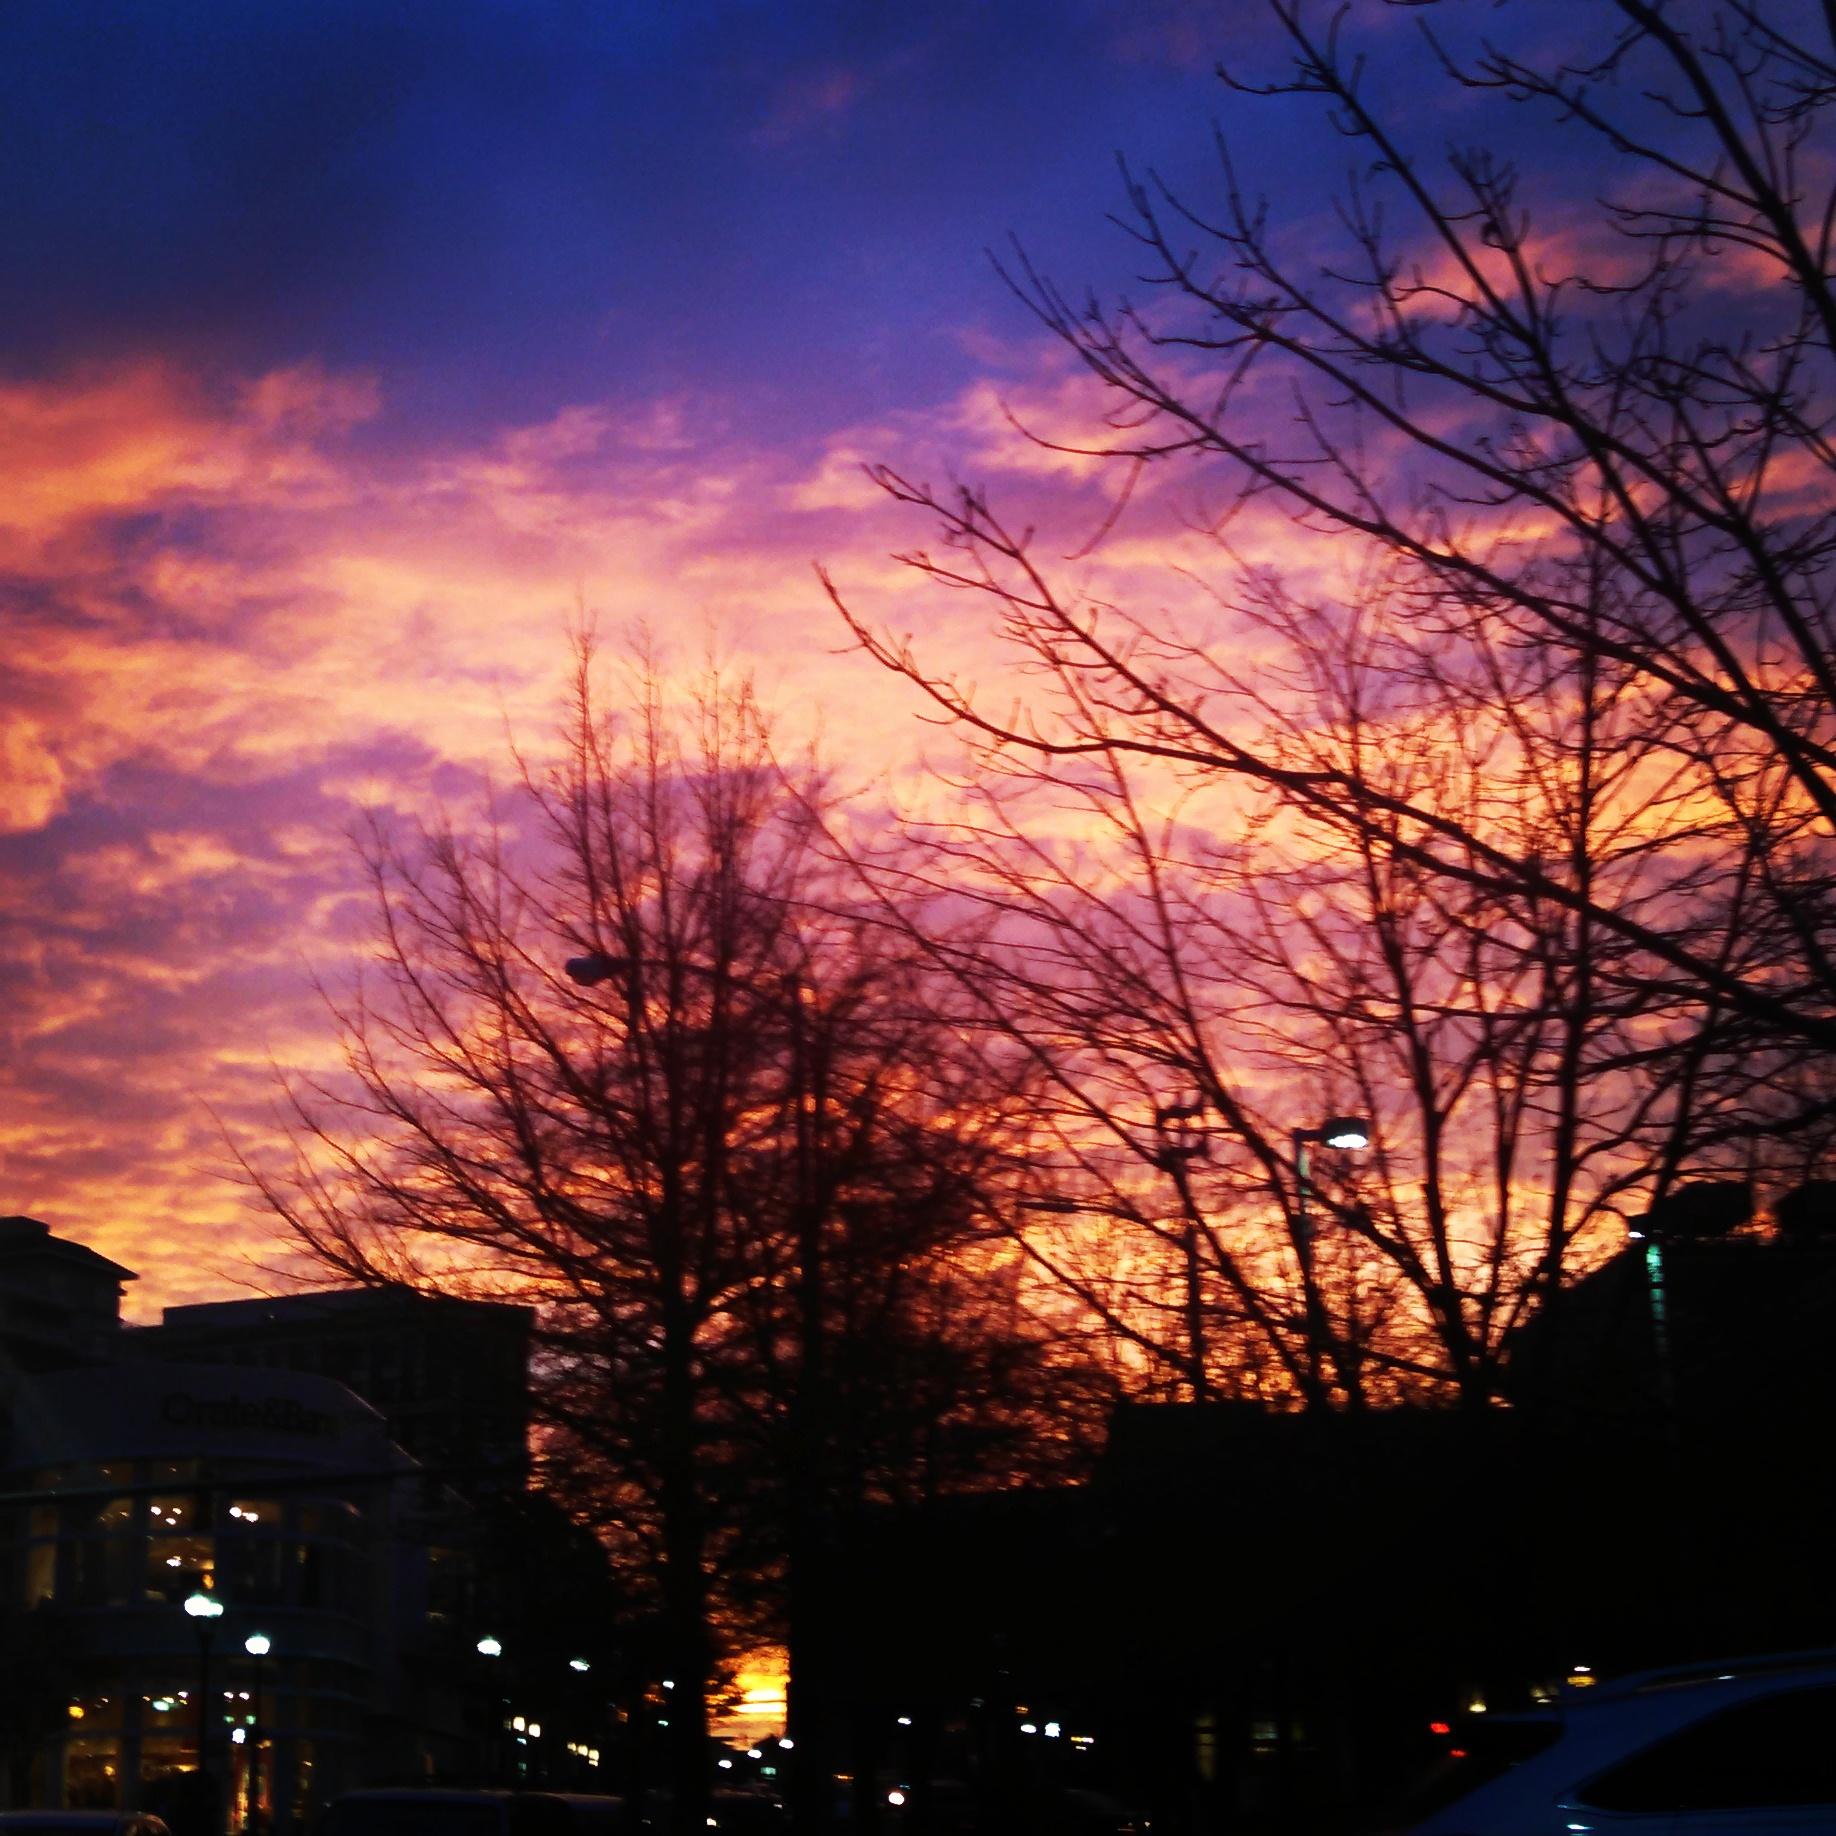 One magical evening in my neighborhood.